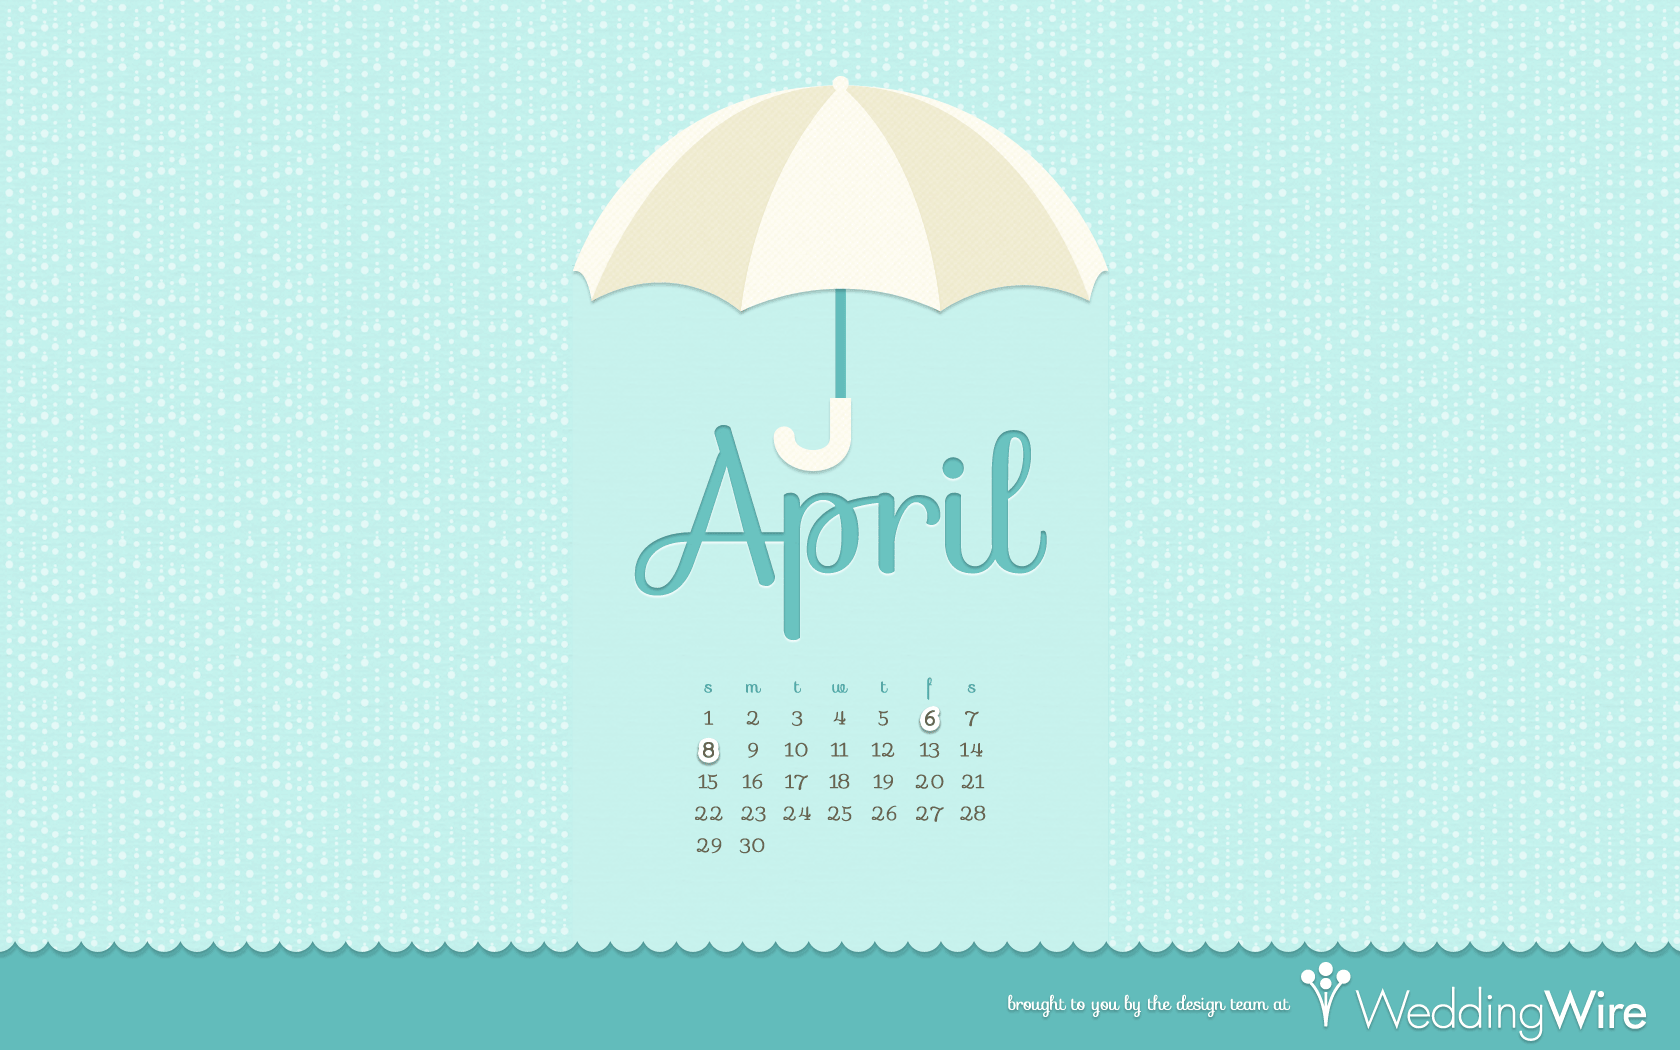 Fun Freebies April Calendar Wallpaper   WeddingWire The Blog 1680x1050